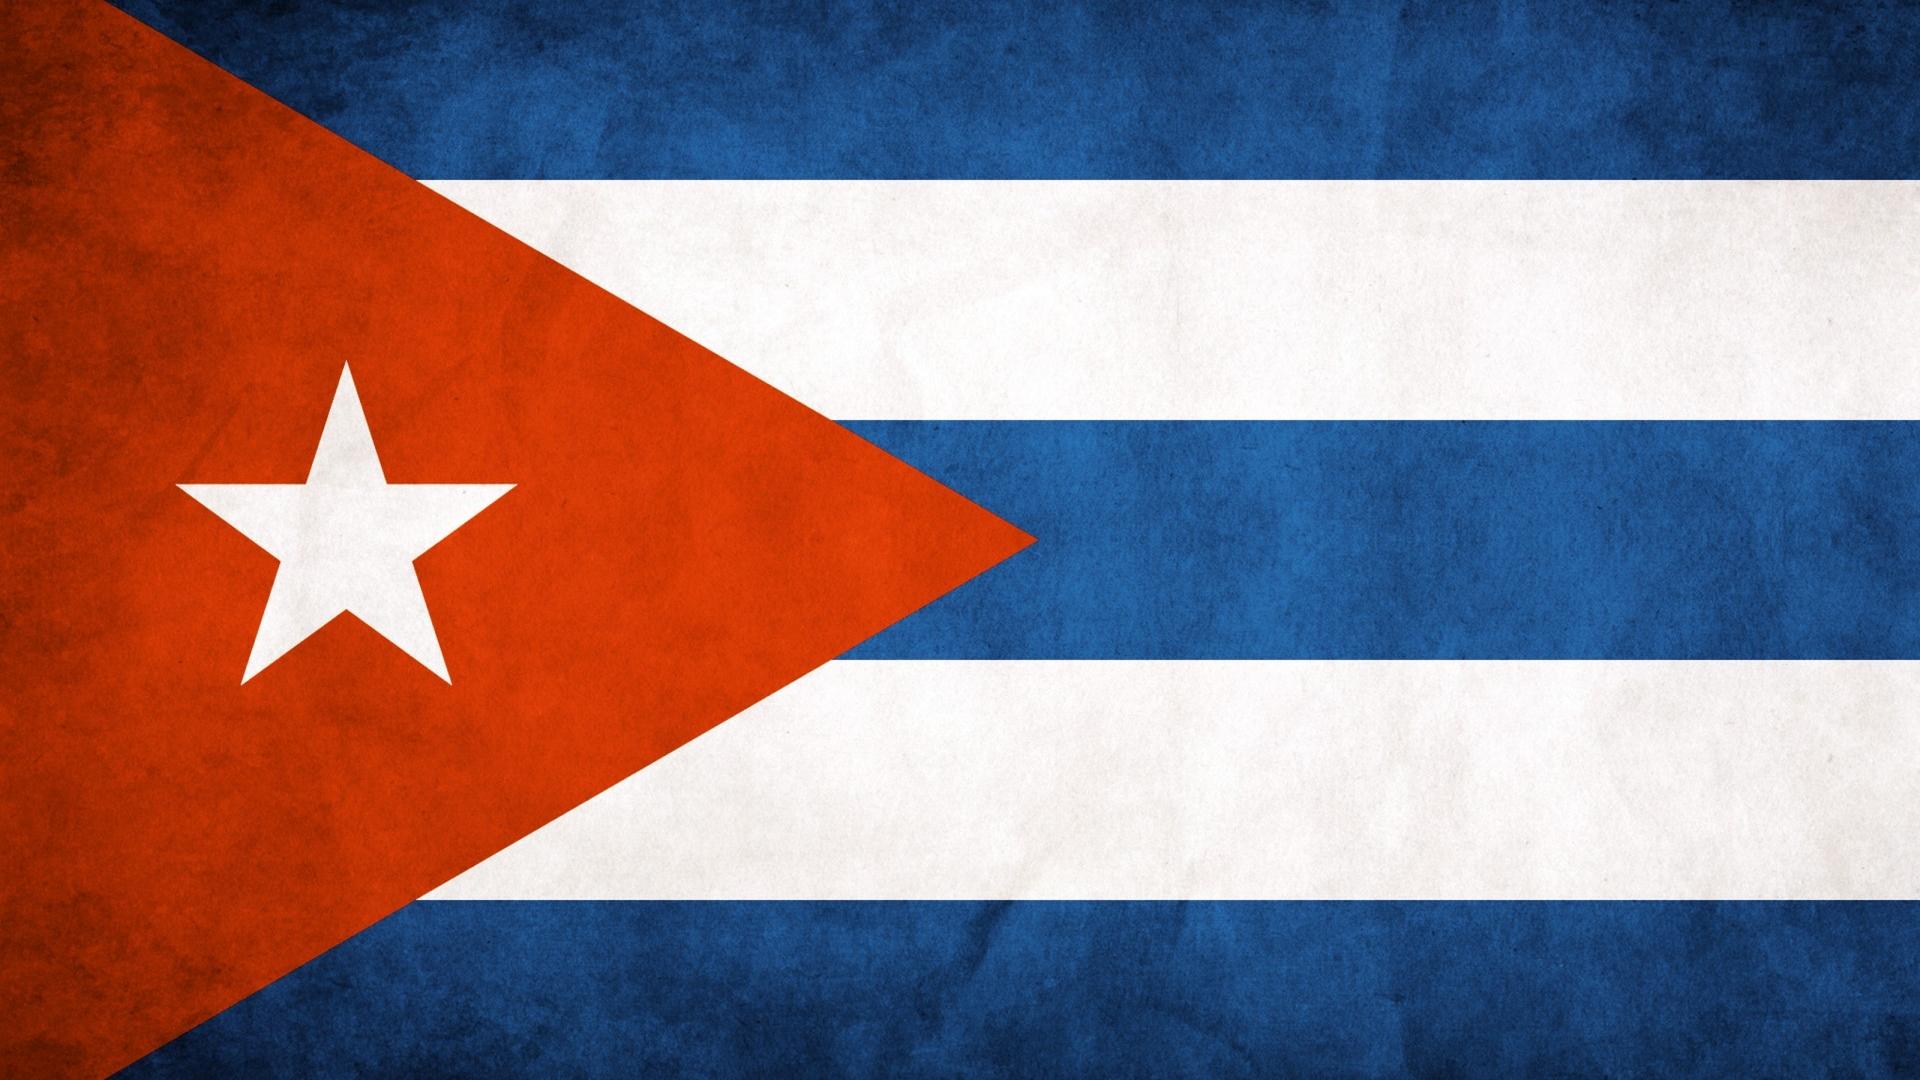 Iphone Os X Wallpaper Cuba Wallpaper Hd Wallpapers